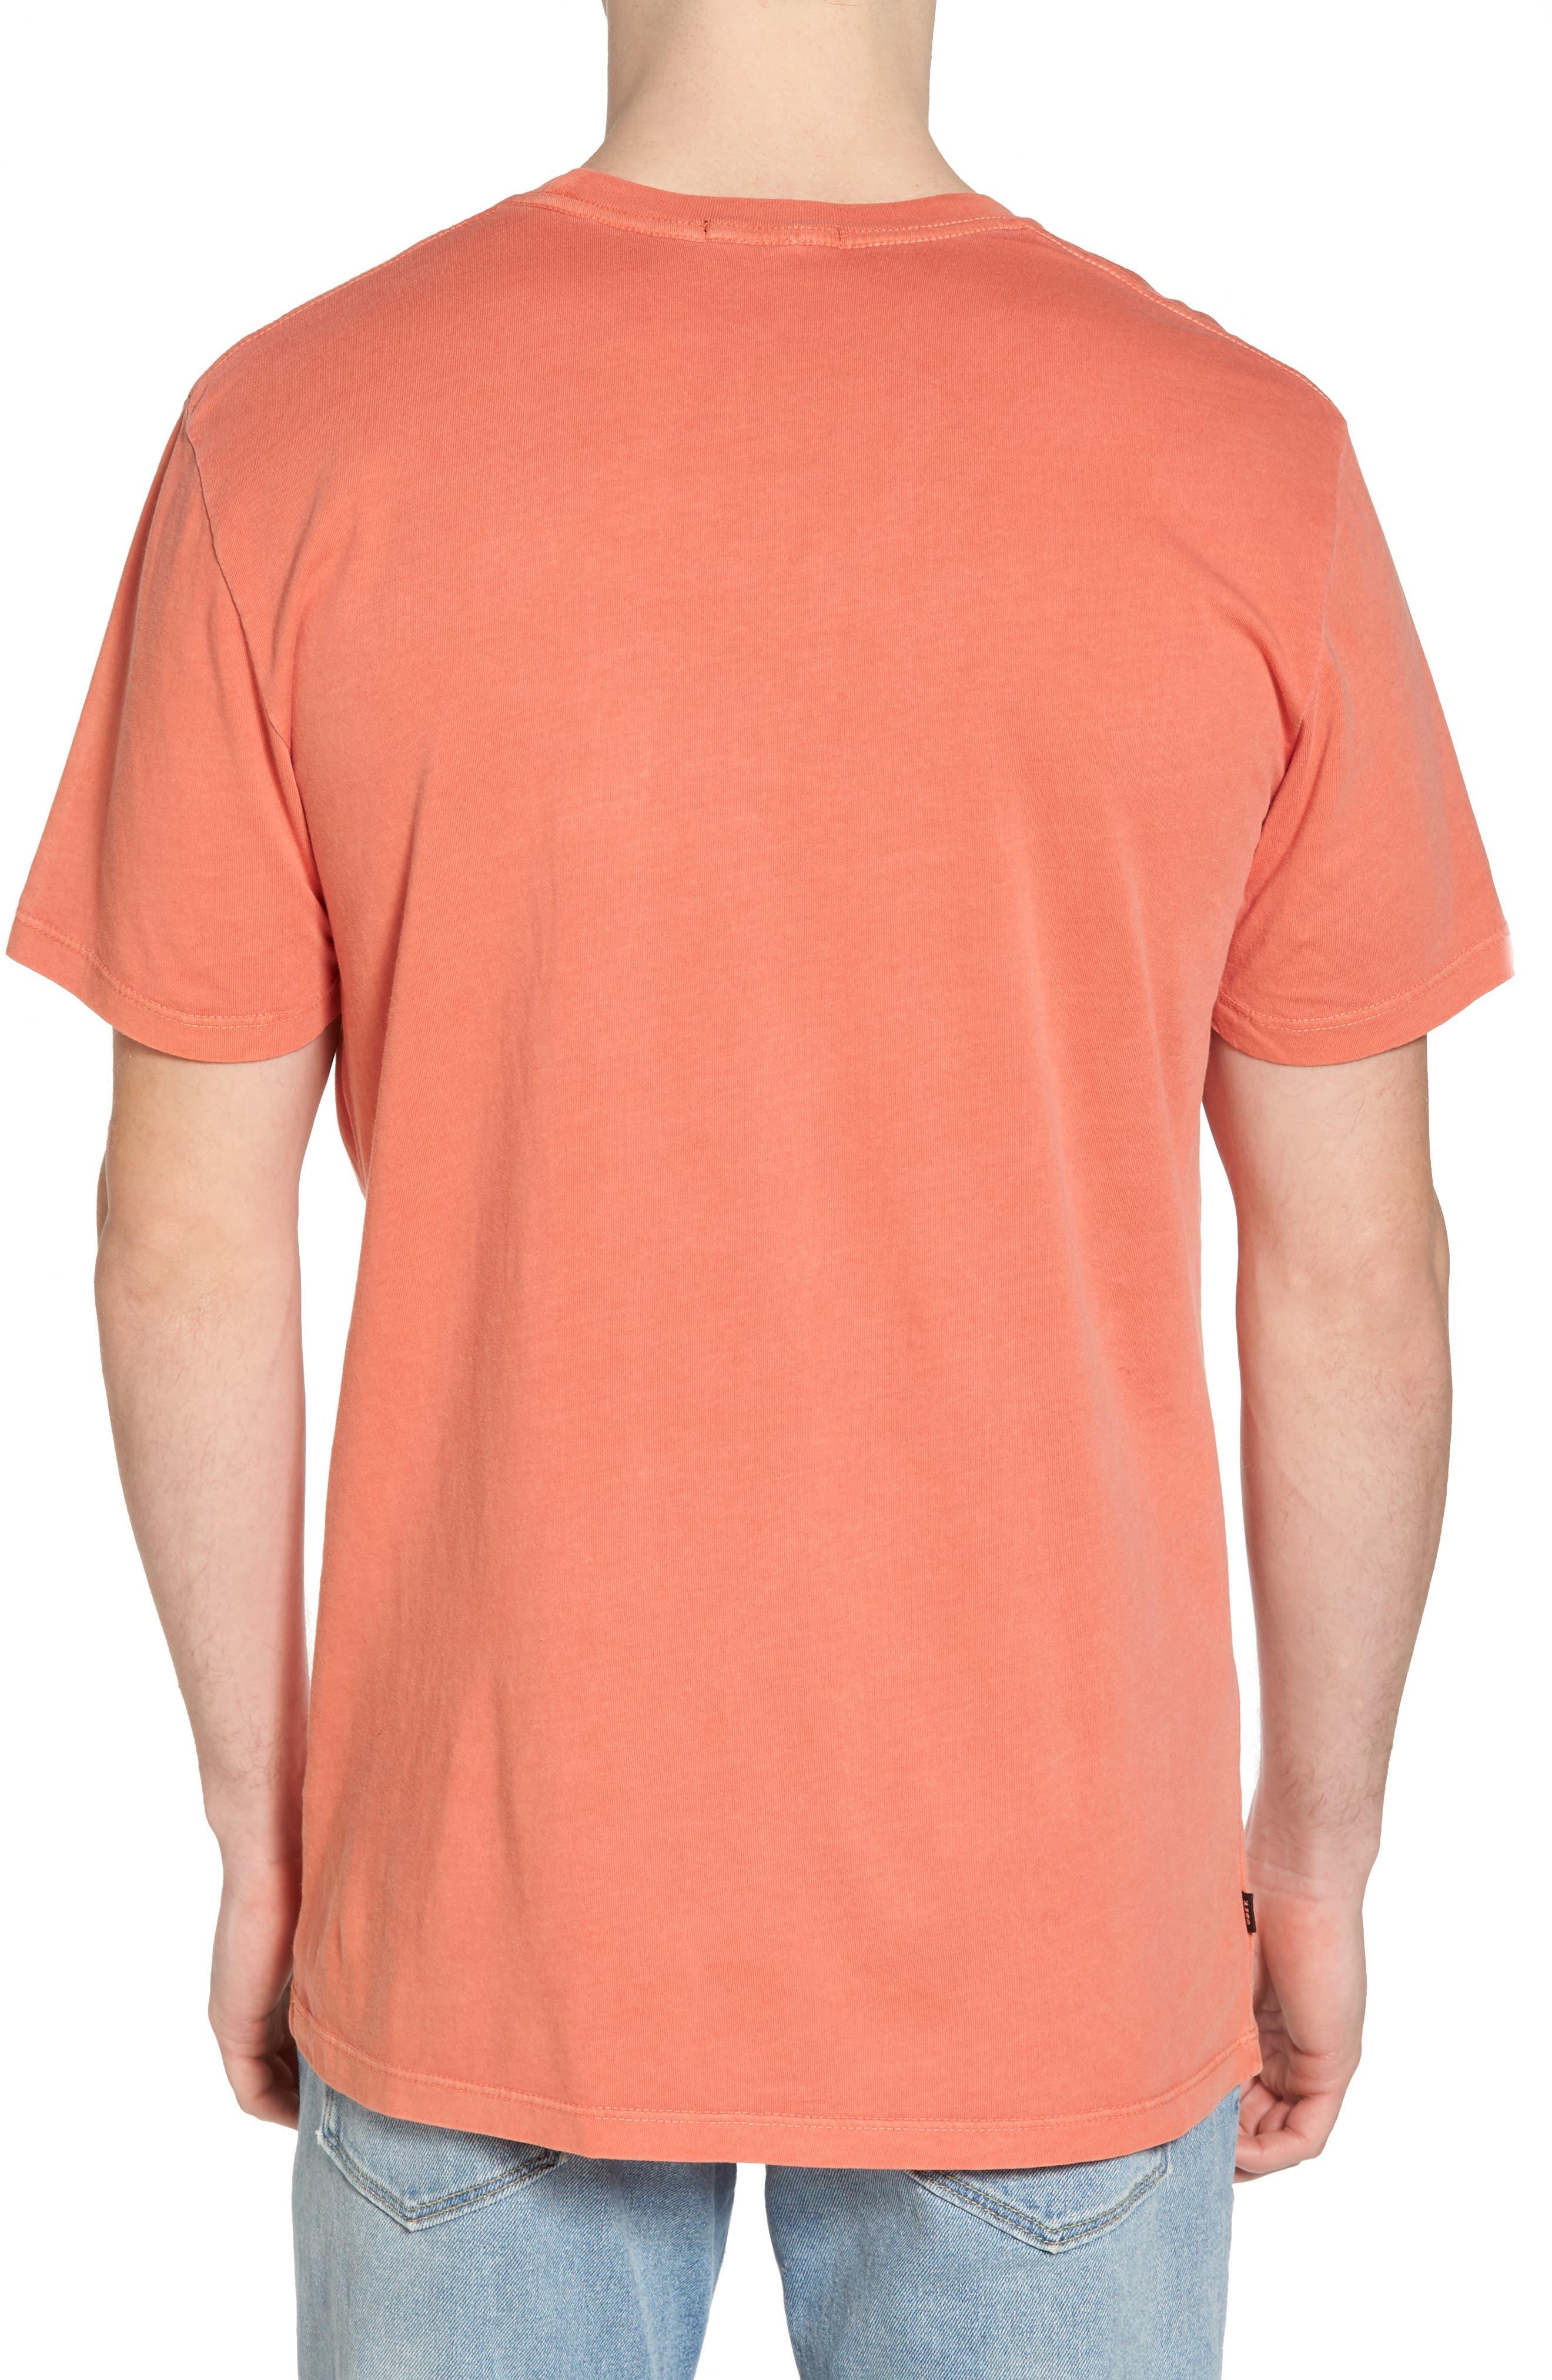 Dominance Graphic T-Shirt,                             Alternate thumbnail 2, color,